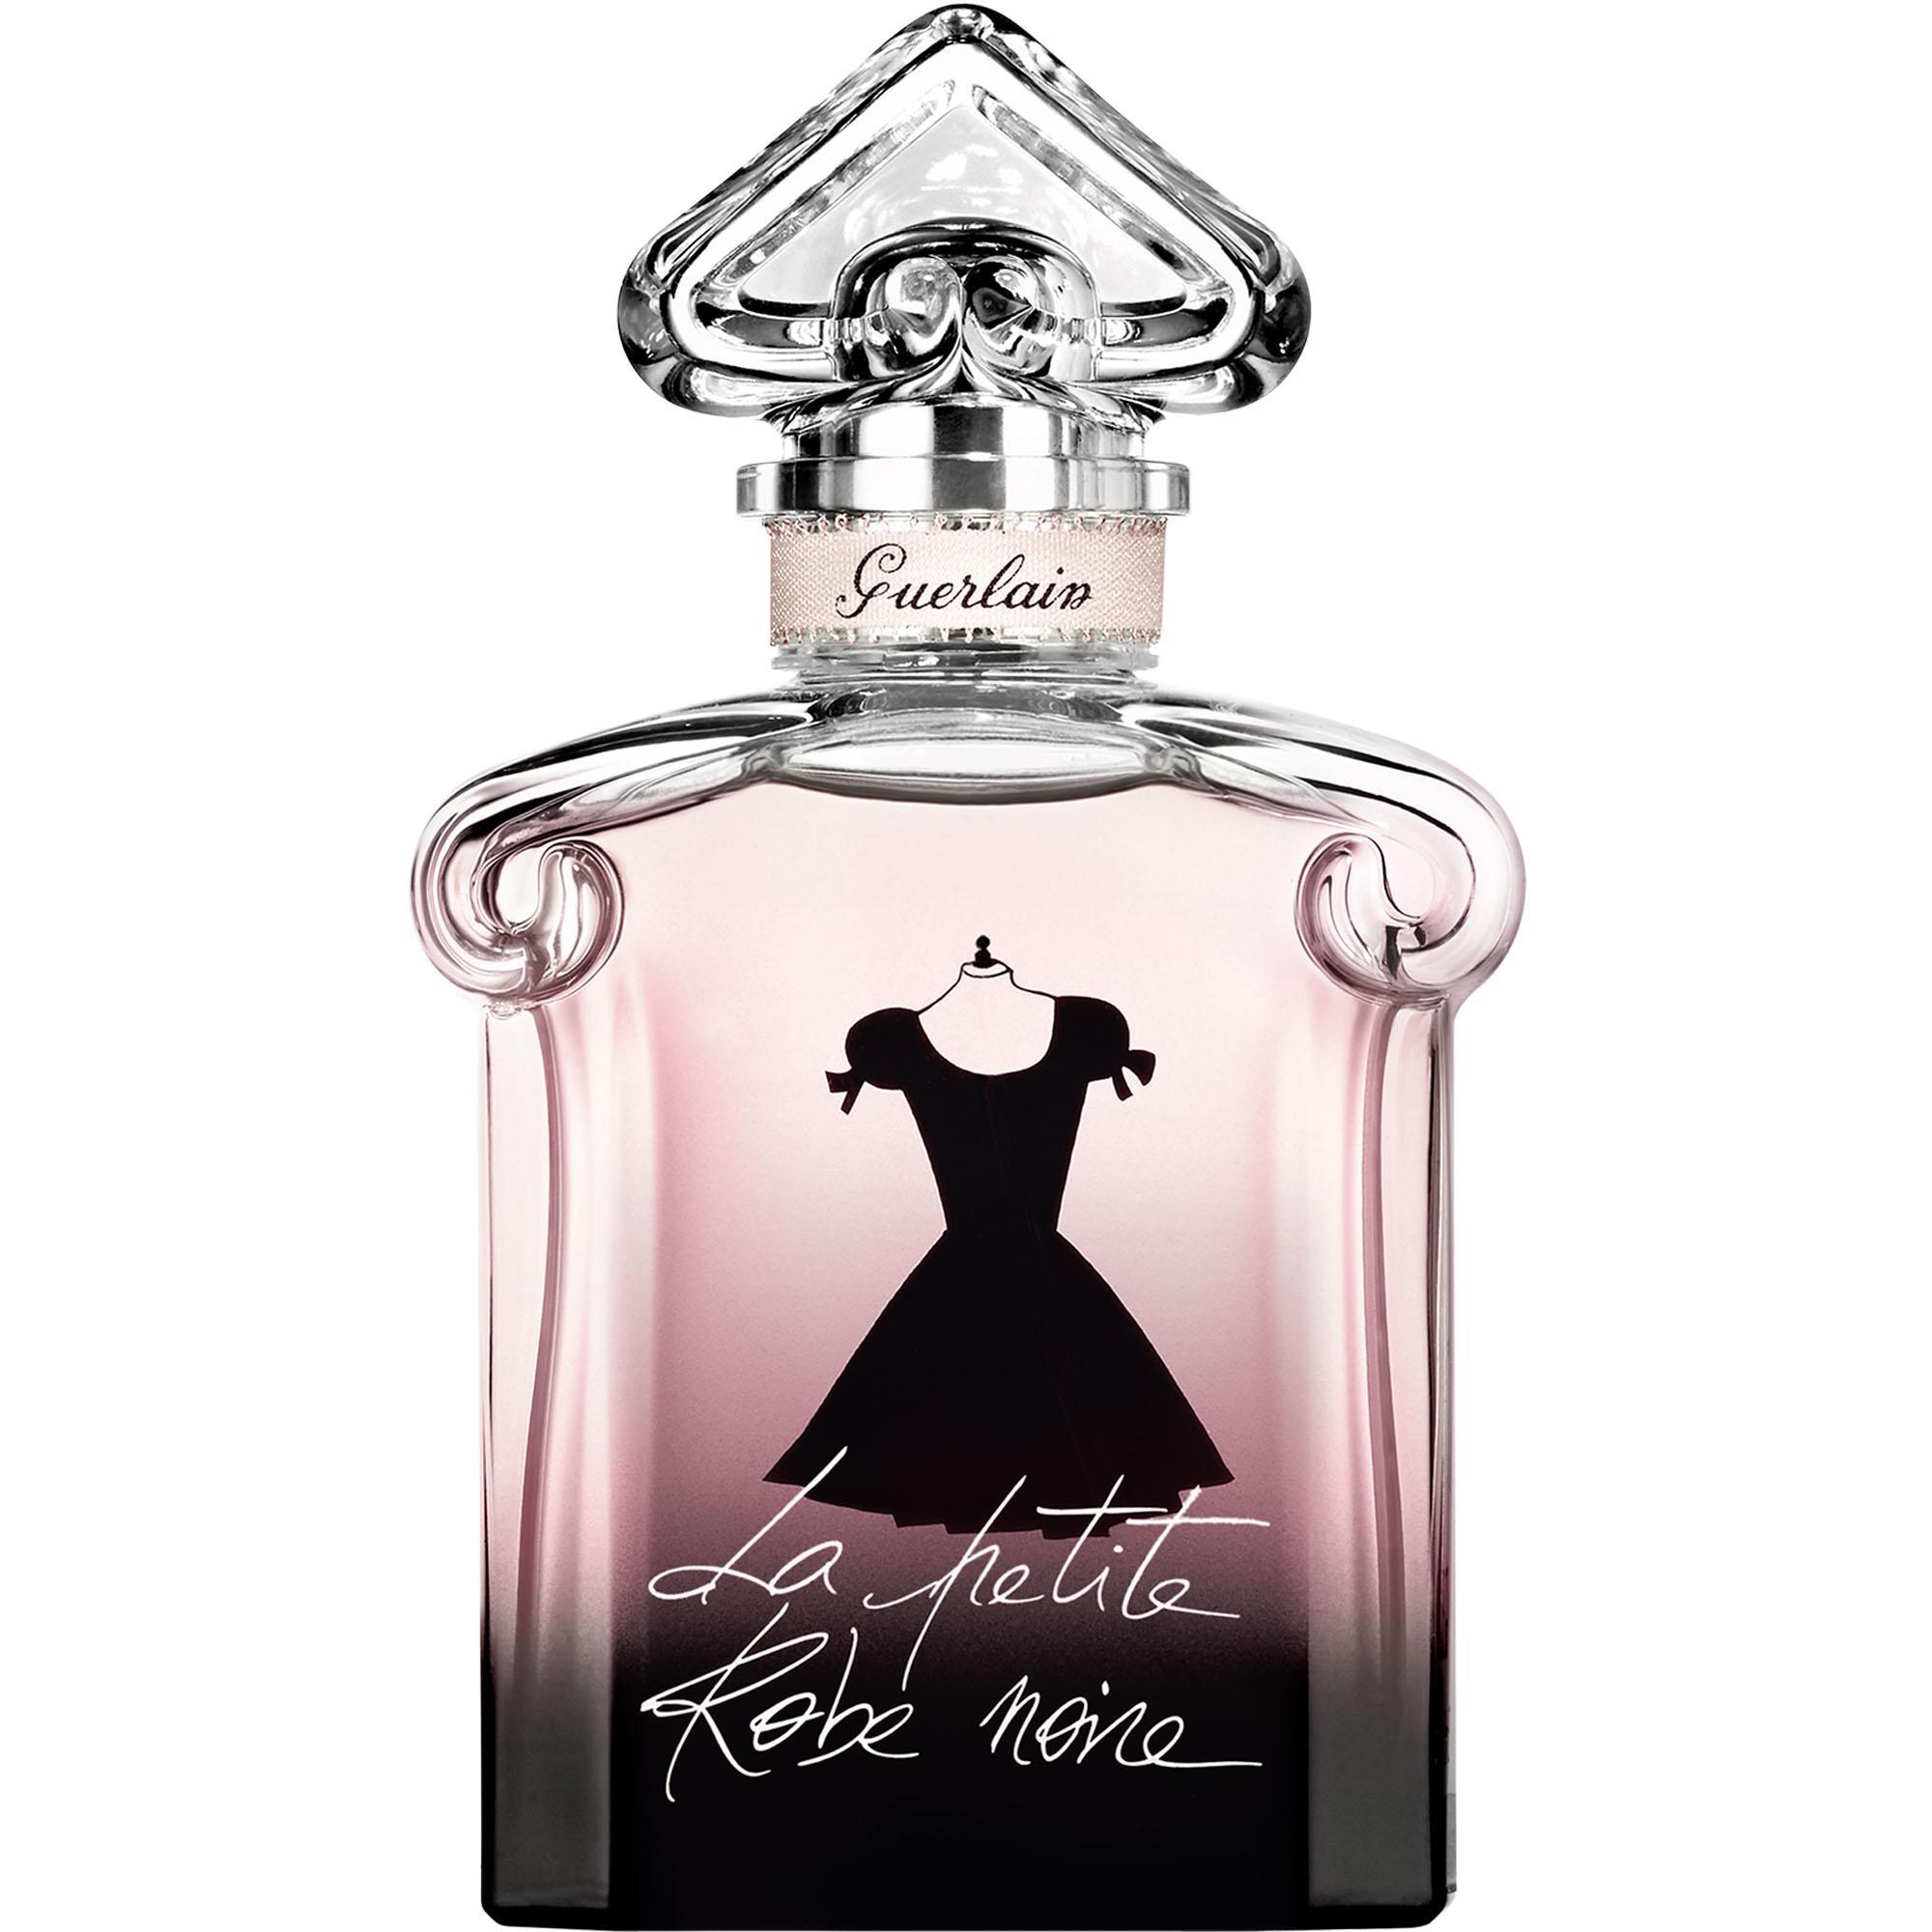 Petite robe noir parfum